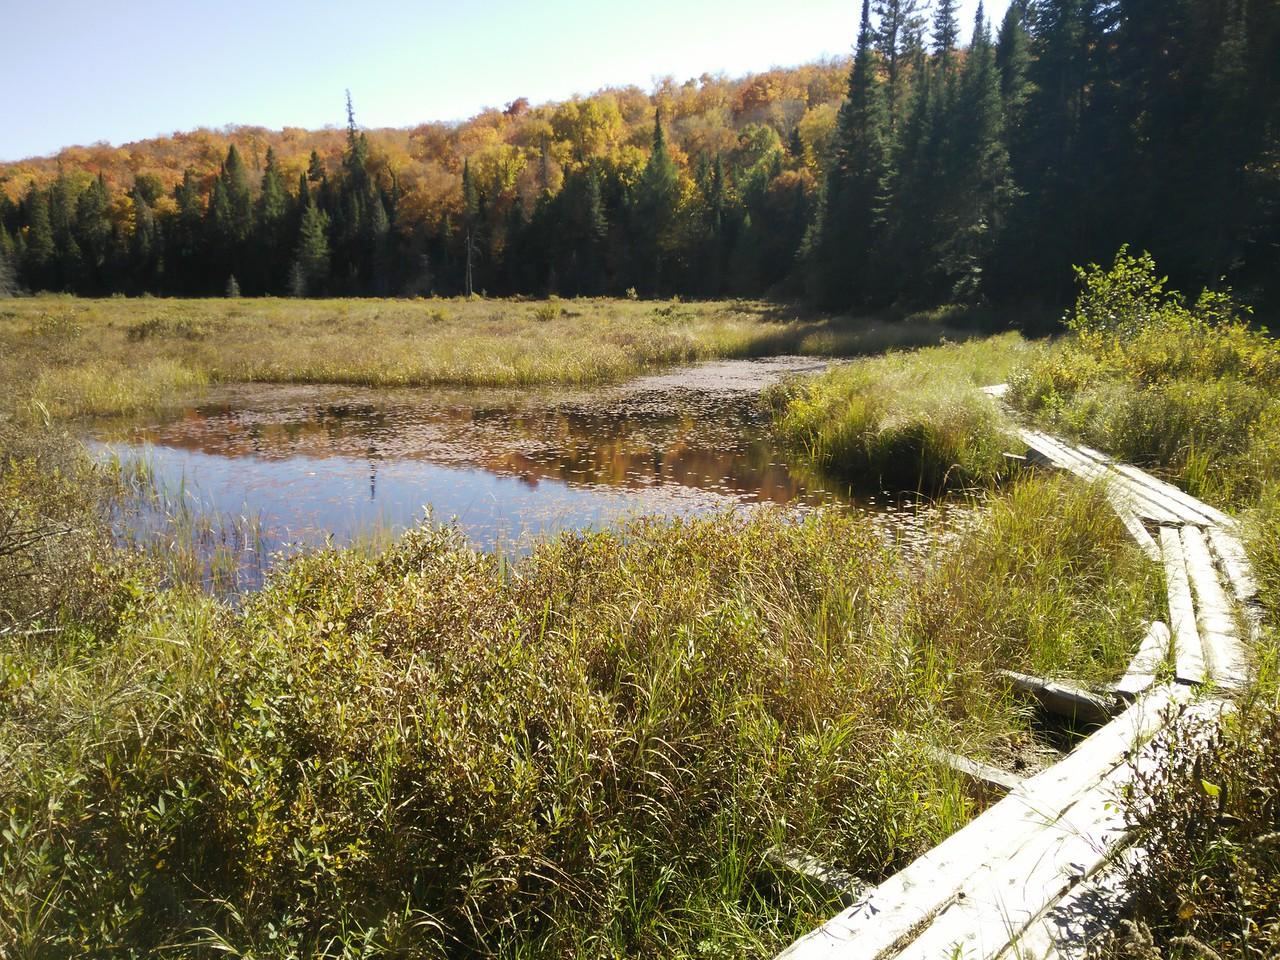 Mink Creek bridge